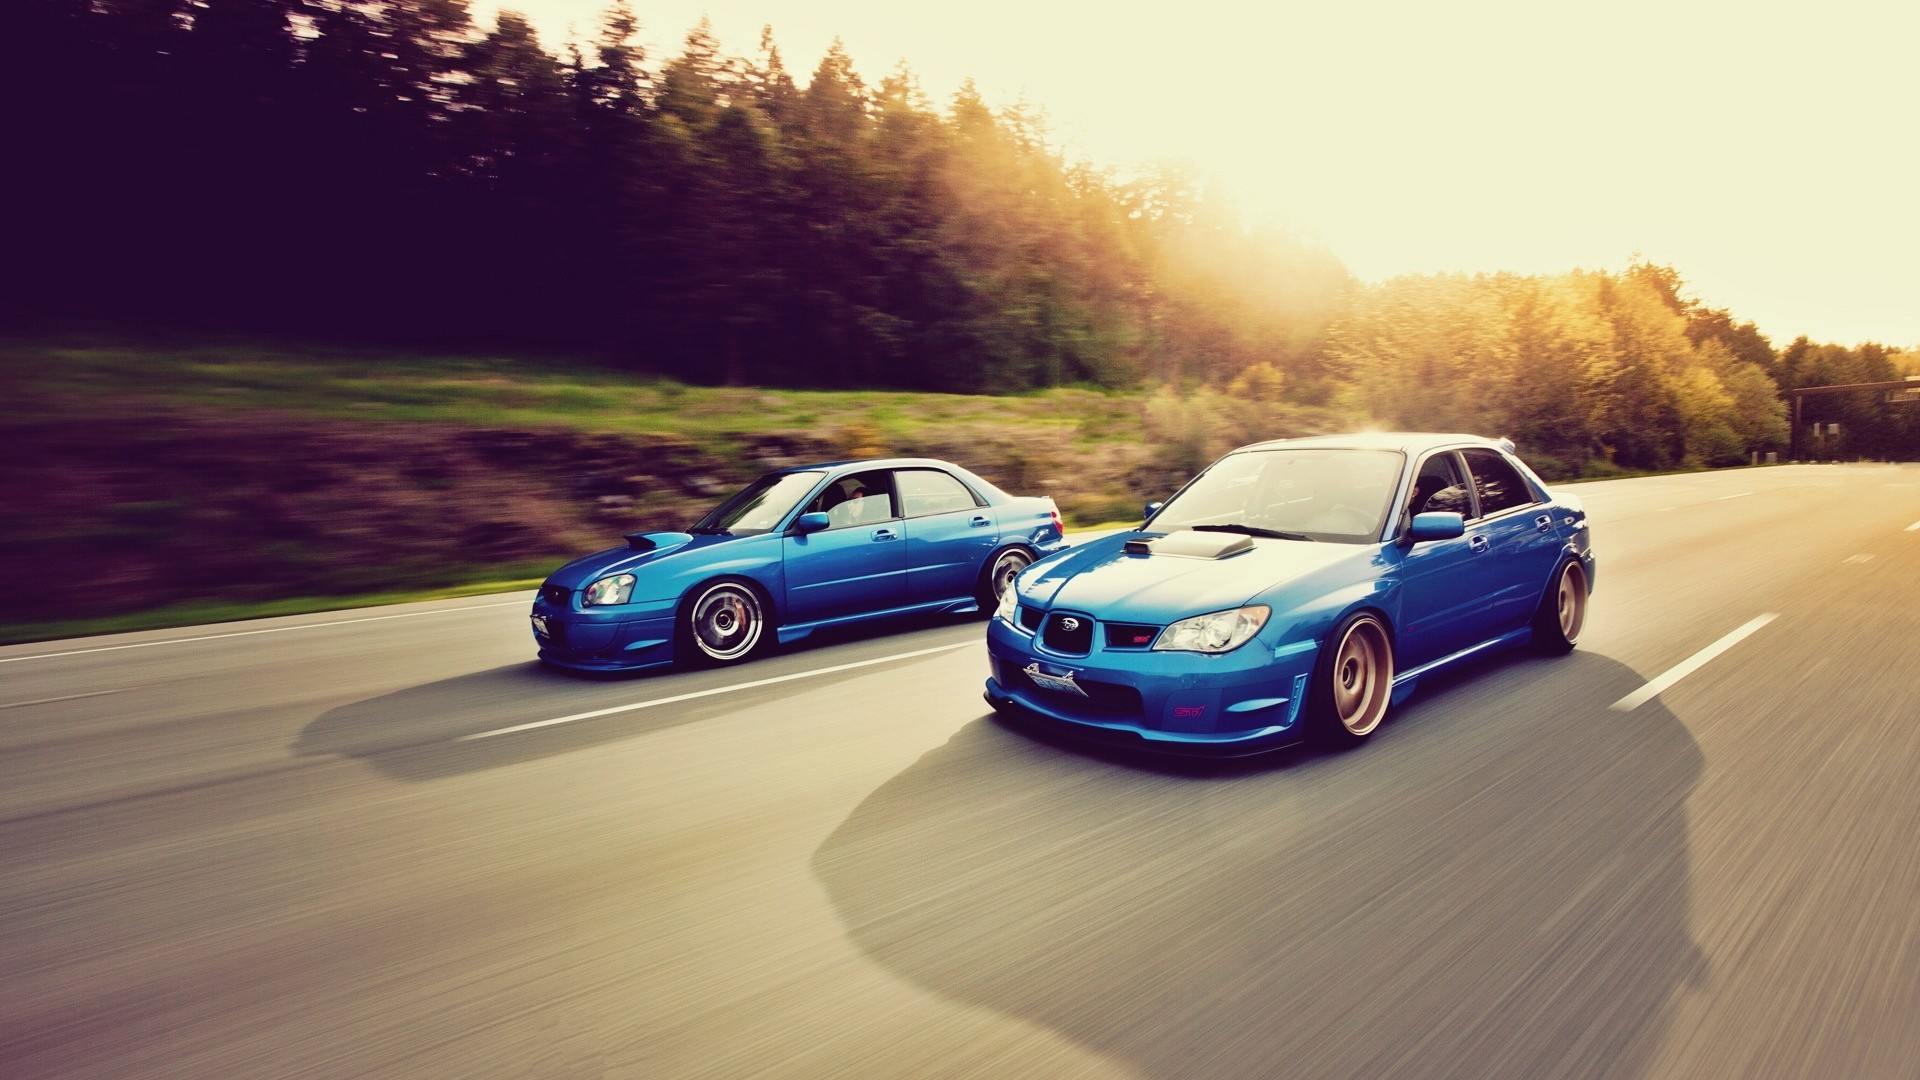 General 1920x1080 car Subaru Subaru Impreza  Stance blue cars colored wheels road sunlight asphalt vehicle impreza